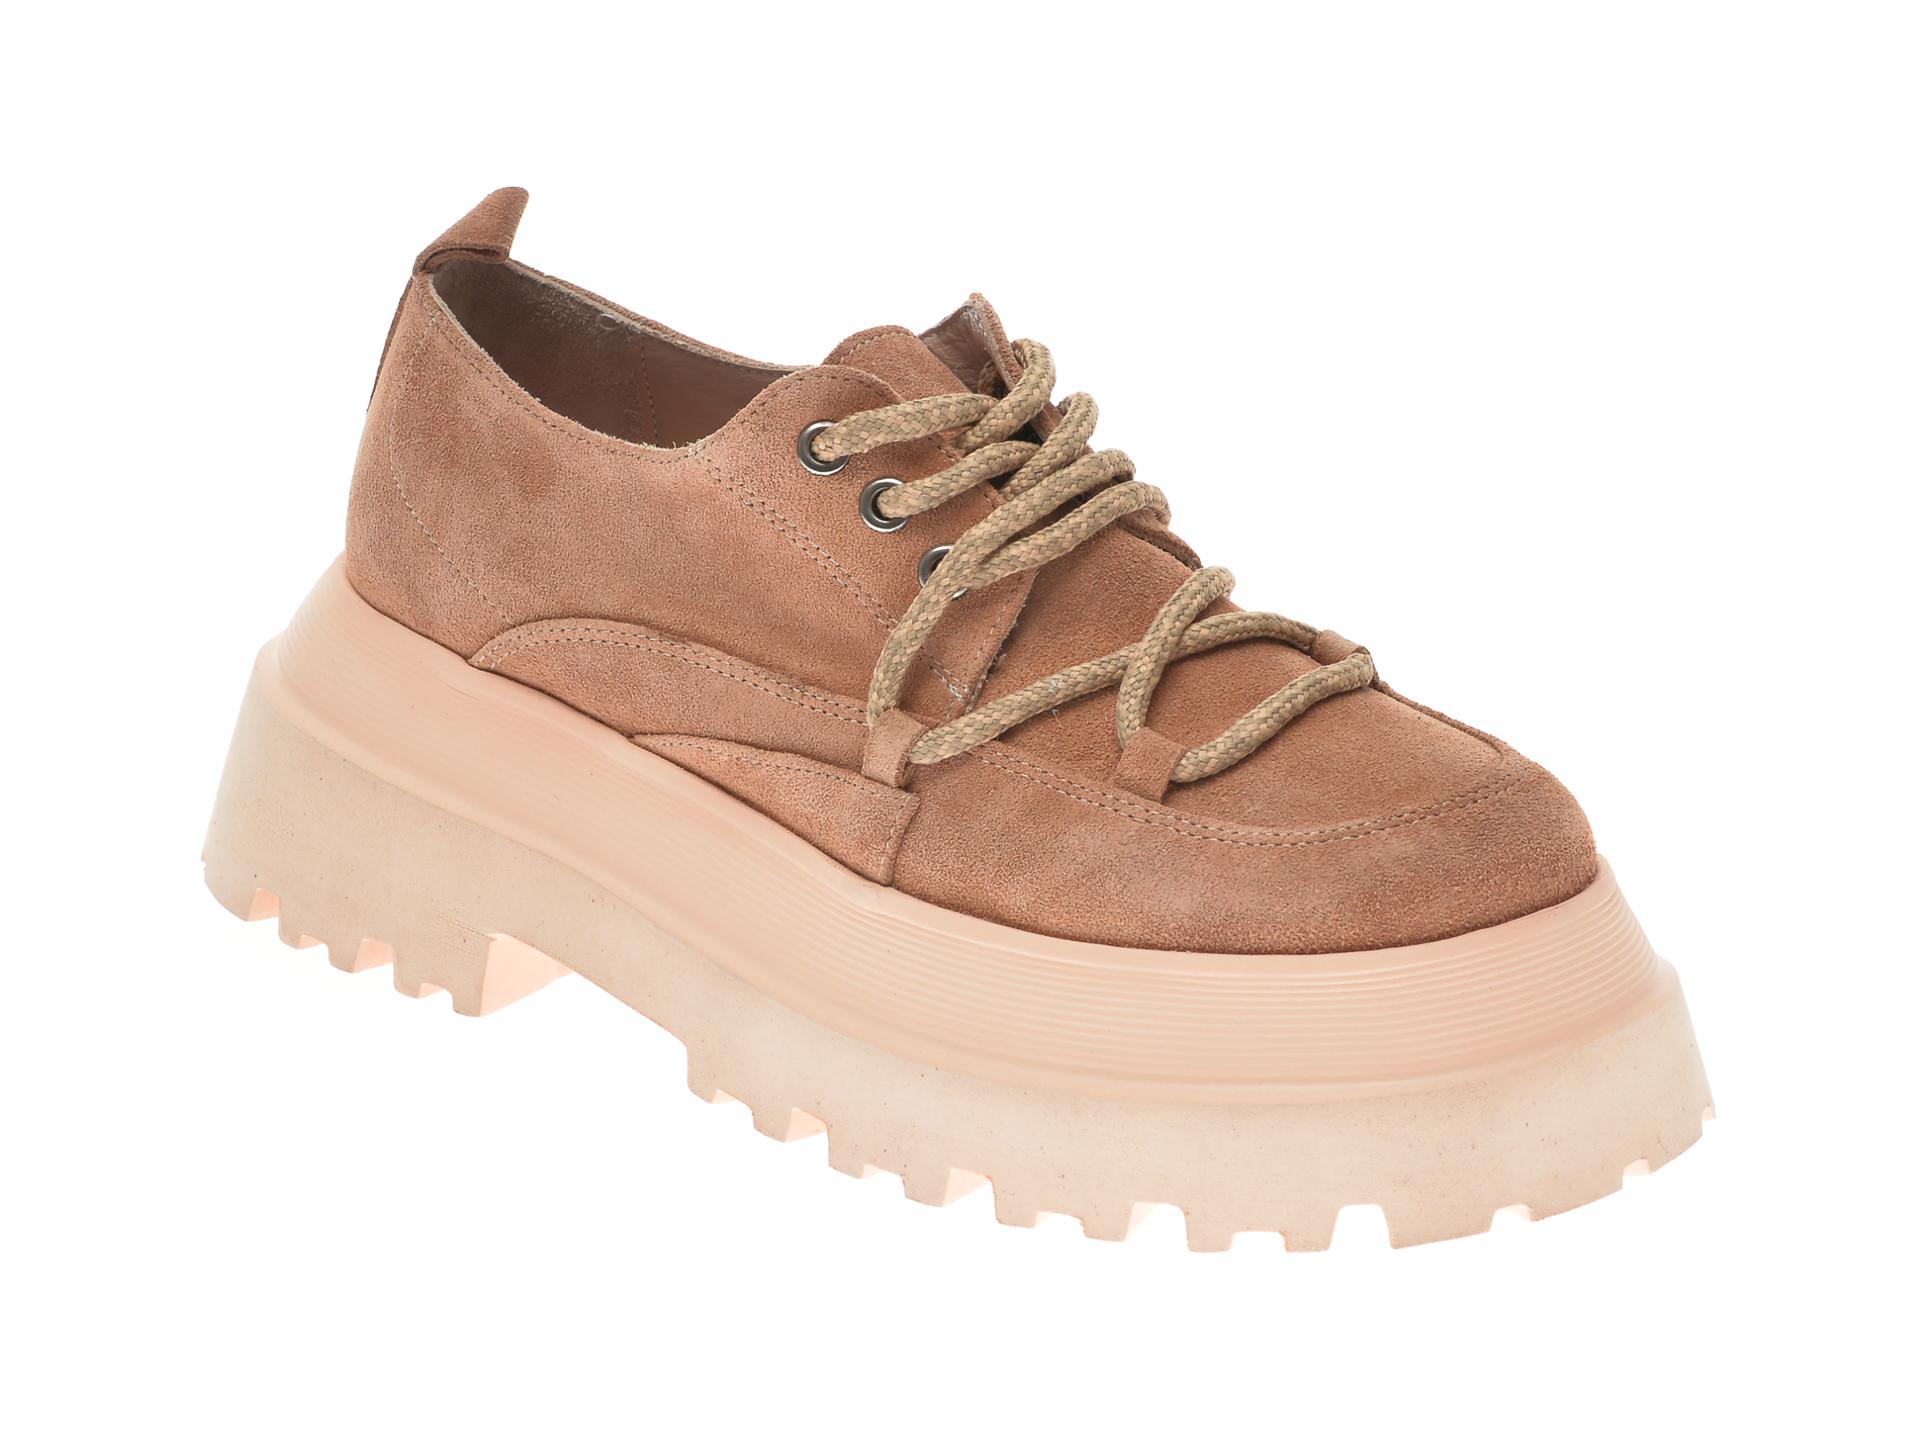 Pantofi FLAVIA PASSINI maro, 11903, din piele intoarsa